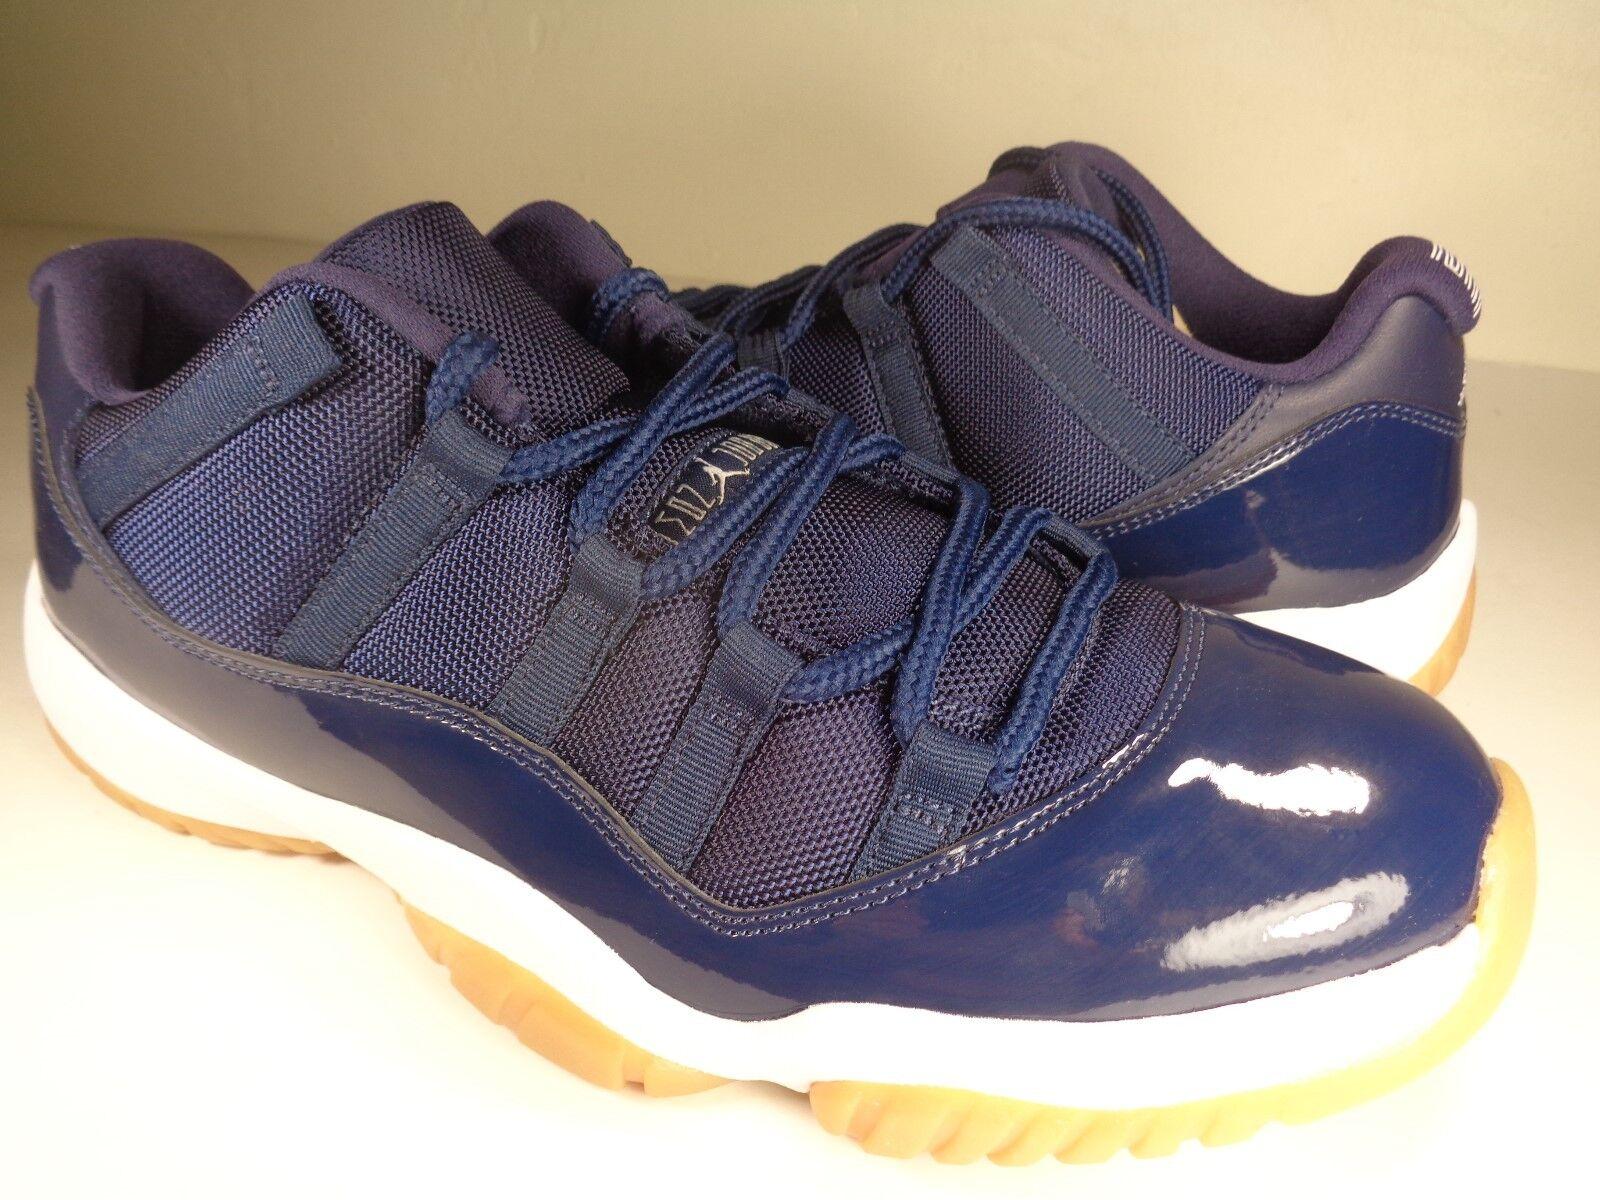 Nike Air Jordan XI 11 Retro Midnight Navy blanc Gum Brown SZ 10.5 (528895-405)